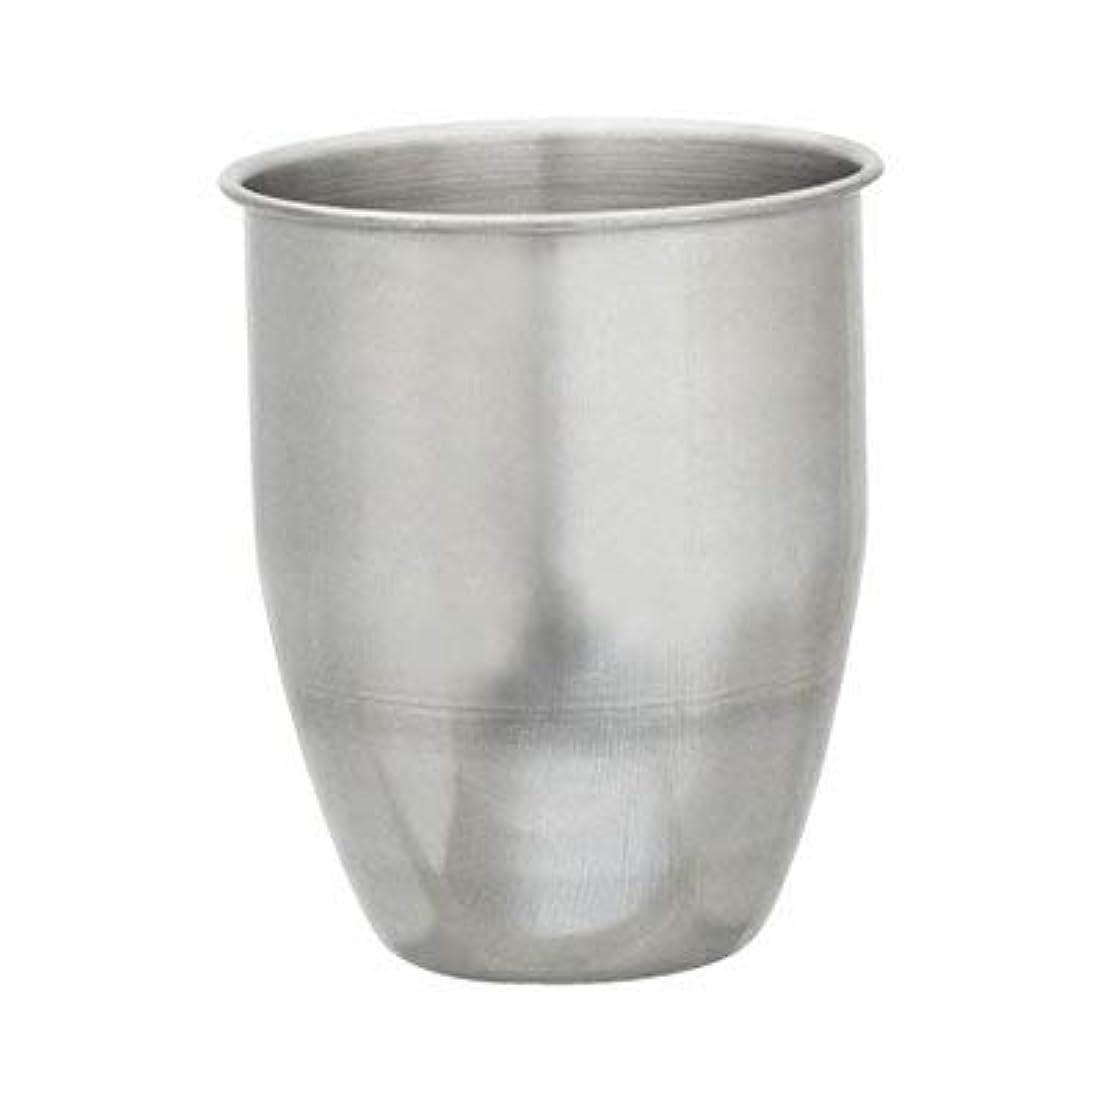 SHAREYDVA ステンレスカップ